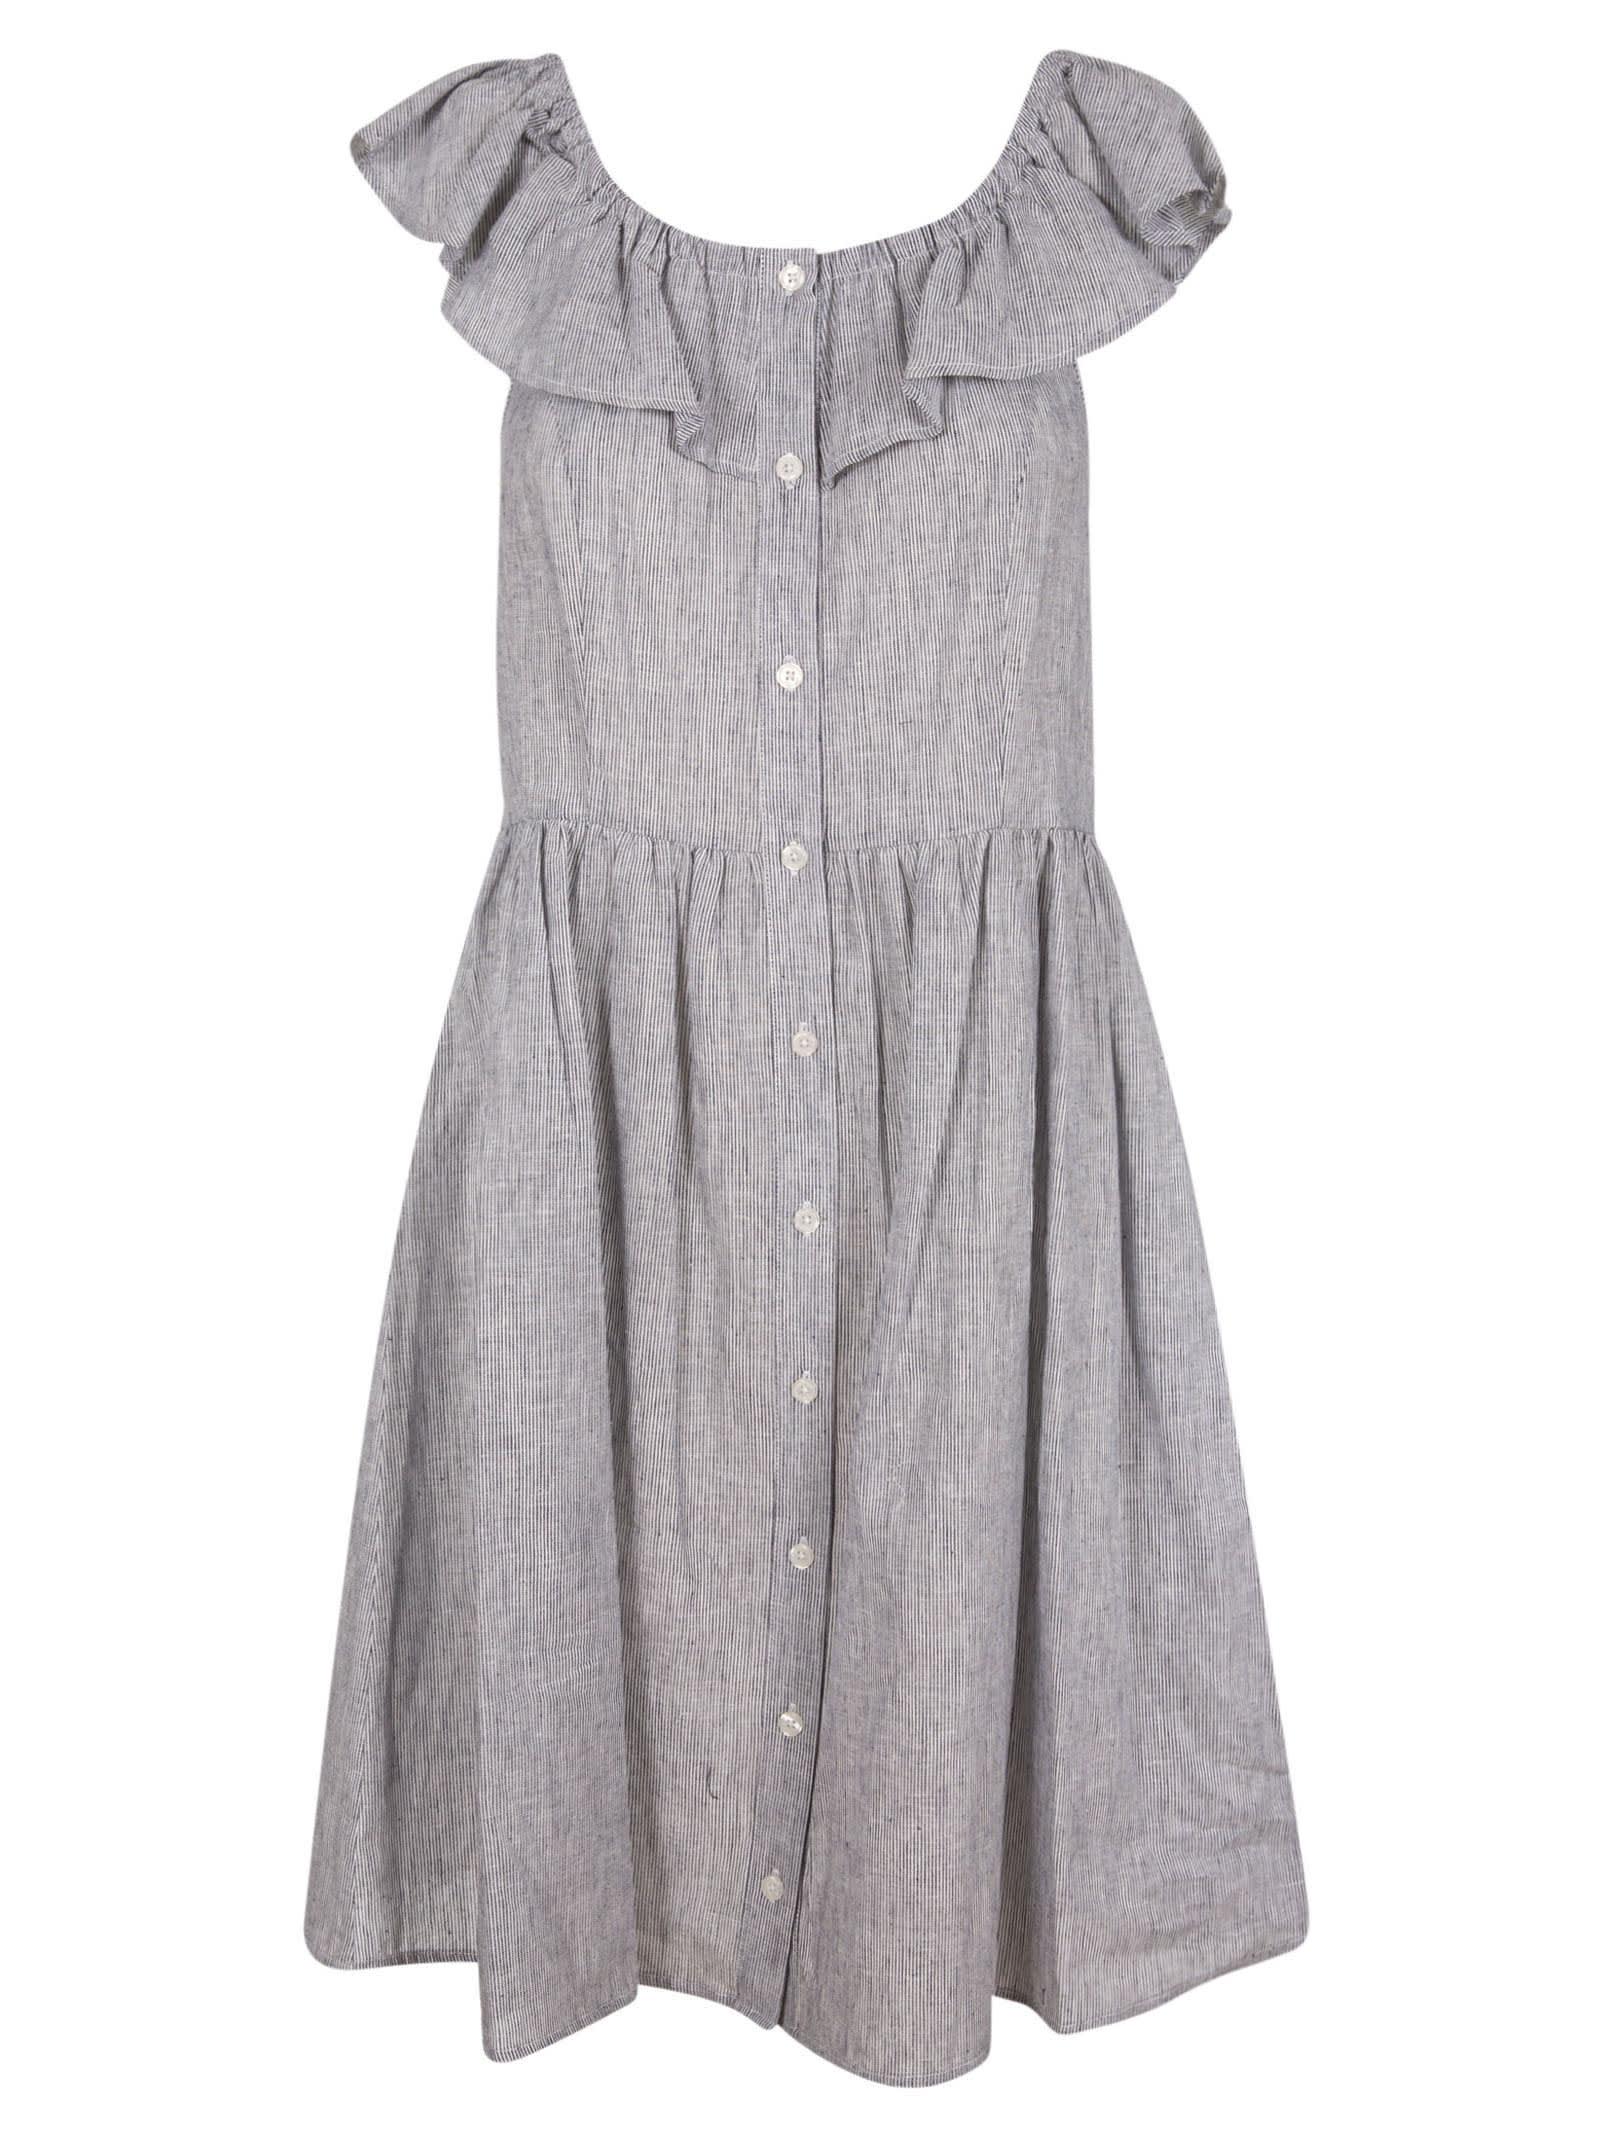 Buy Michael Kors Sleeveless Ruffled Dress online, shop Michael Kors with free shipping